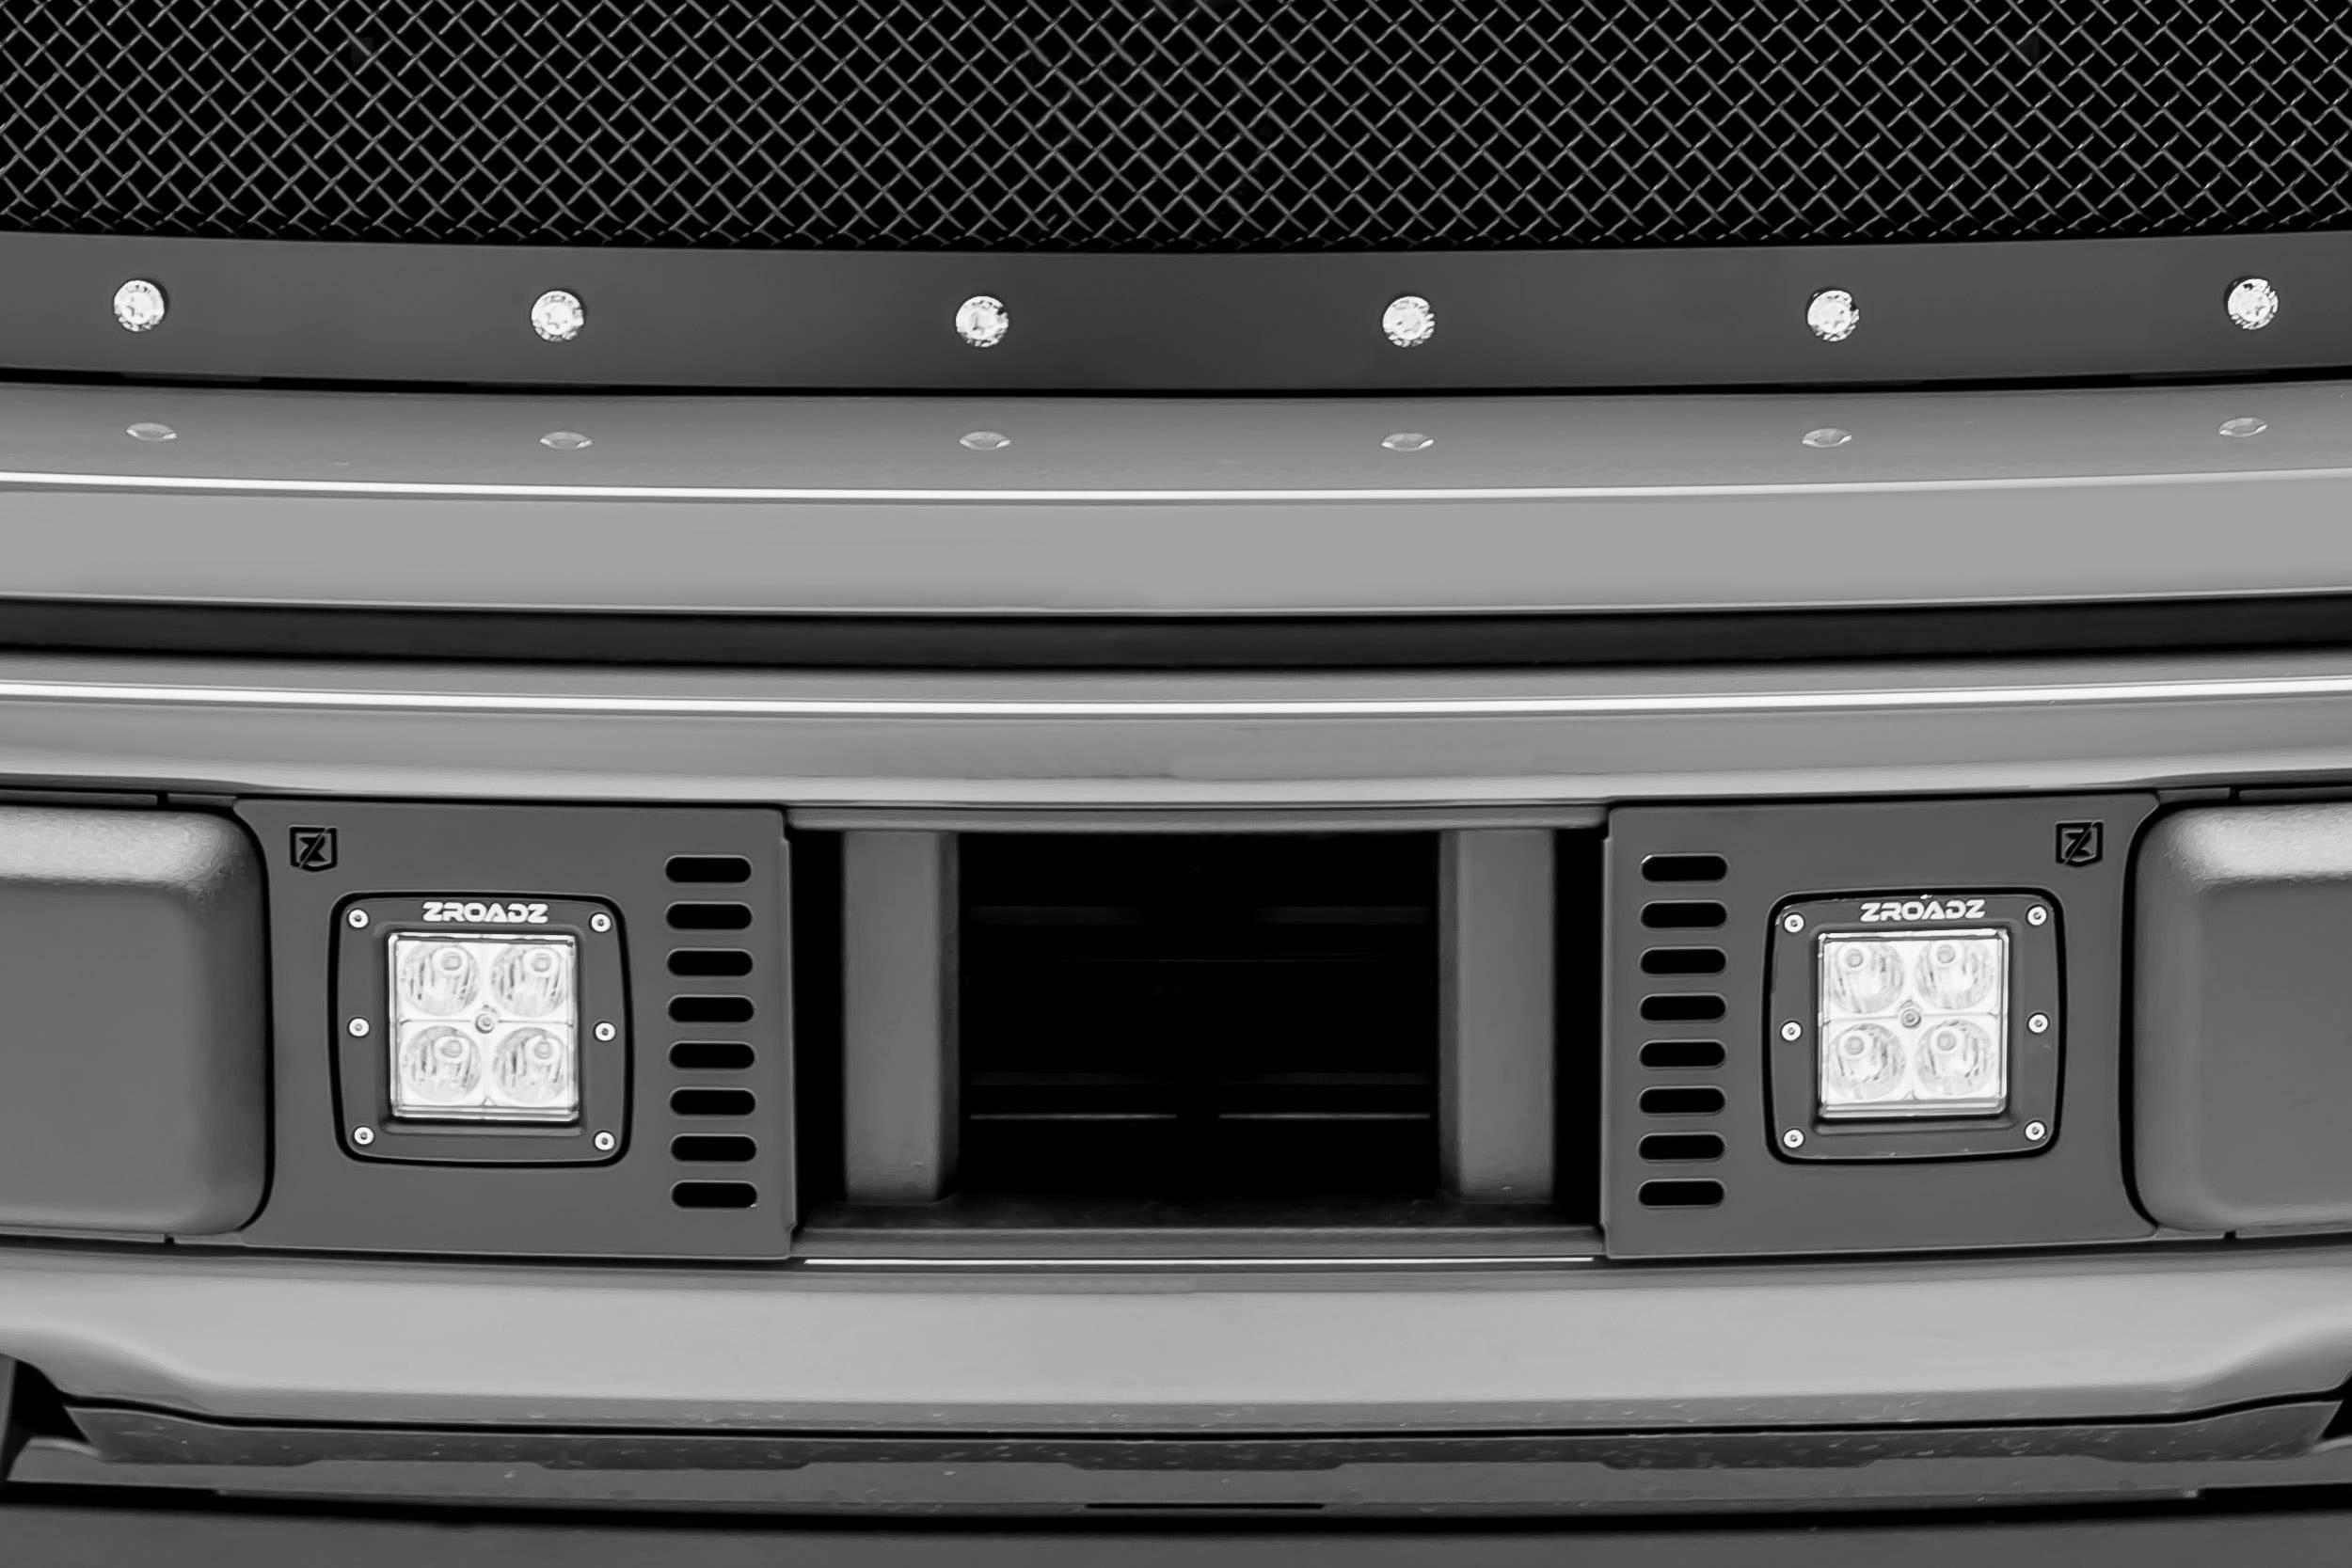 ZROADZ - 2018-2020 Ford F-150 Lariat, Limited Front Bumper Center LED Kit with (2) 3 Inch LED Pod Lights - PN# Z325711-KIT